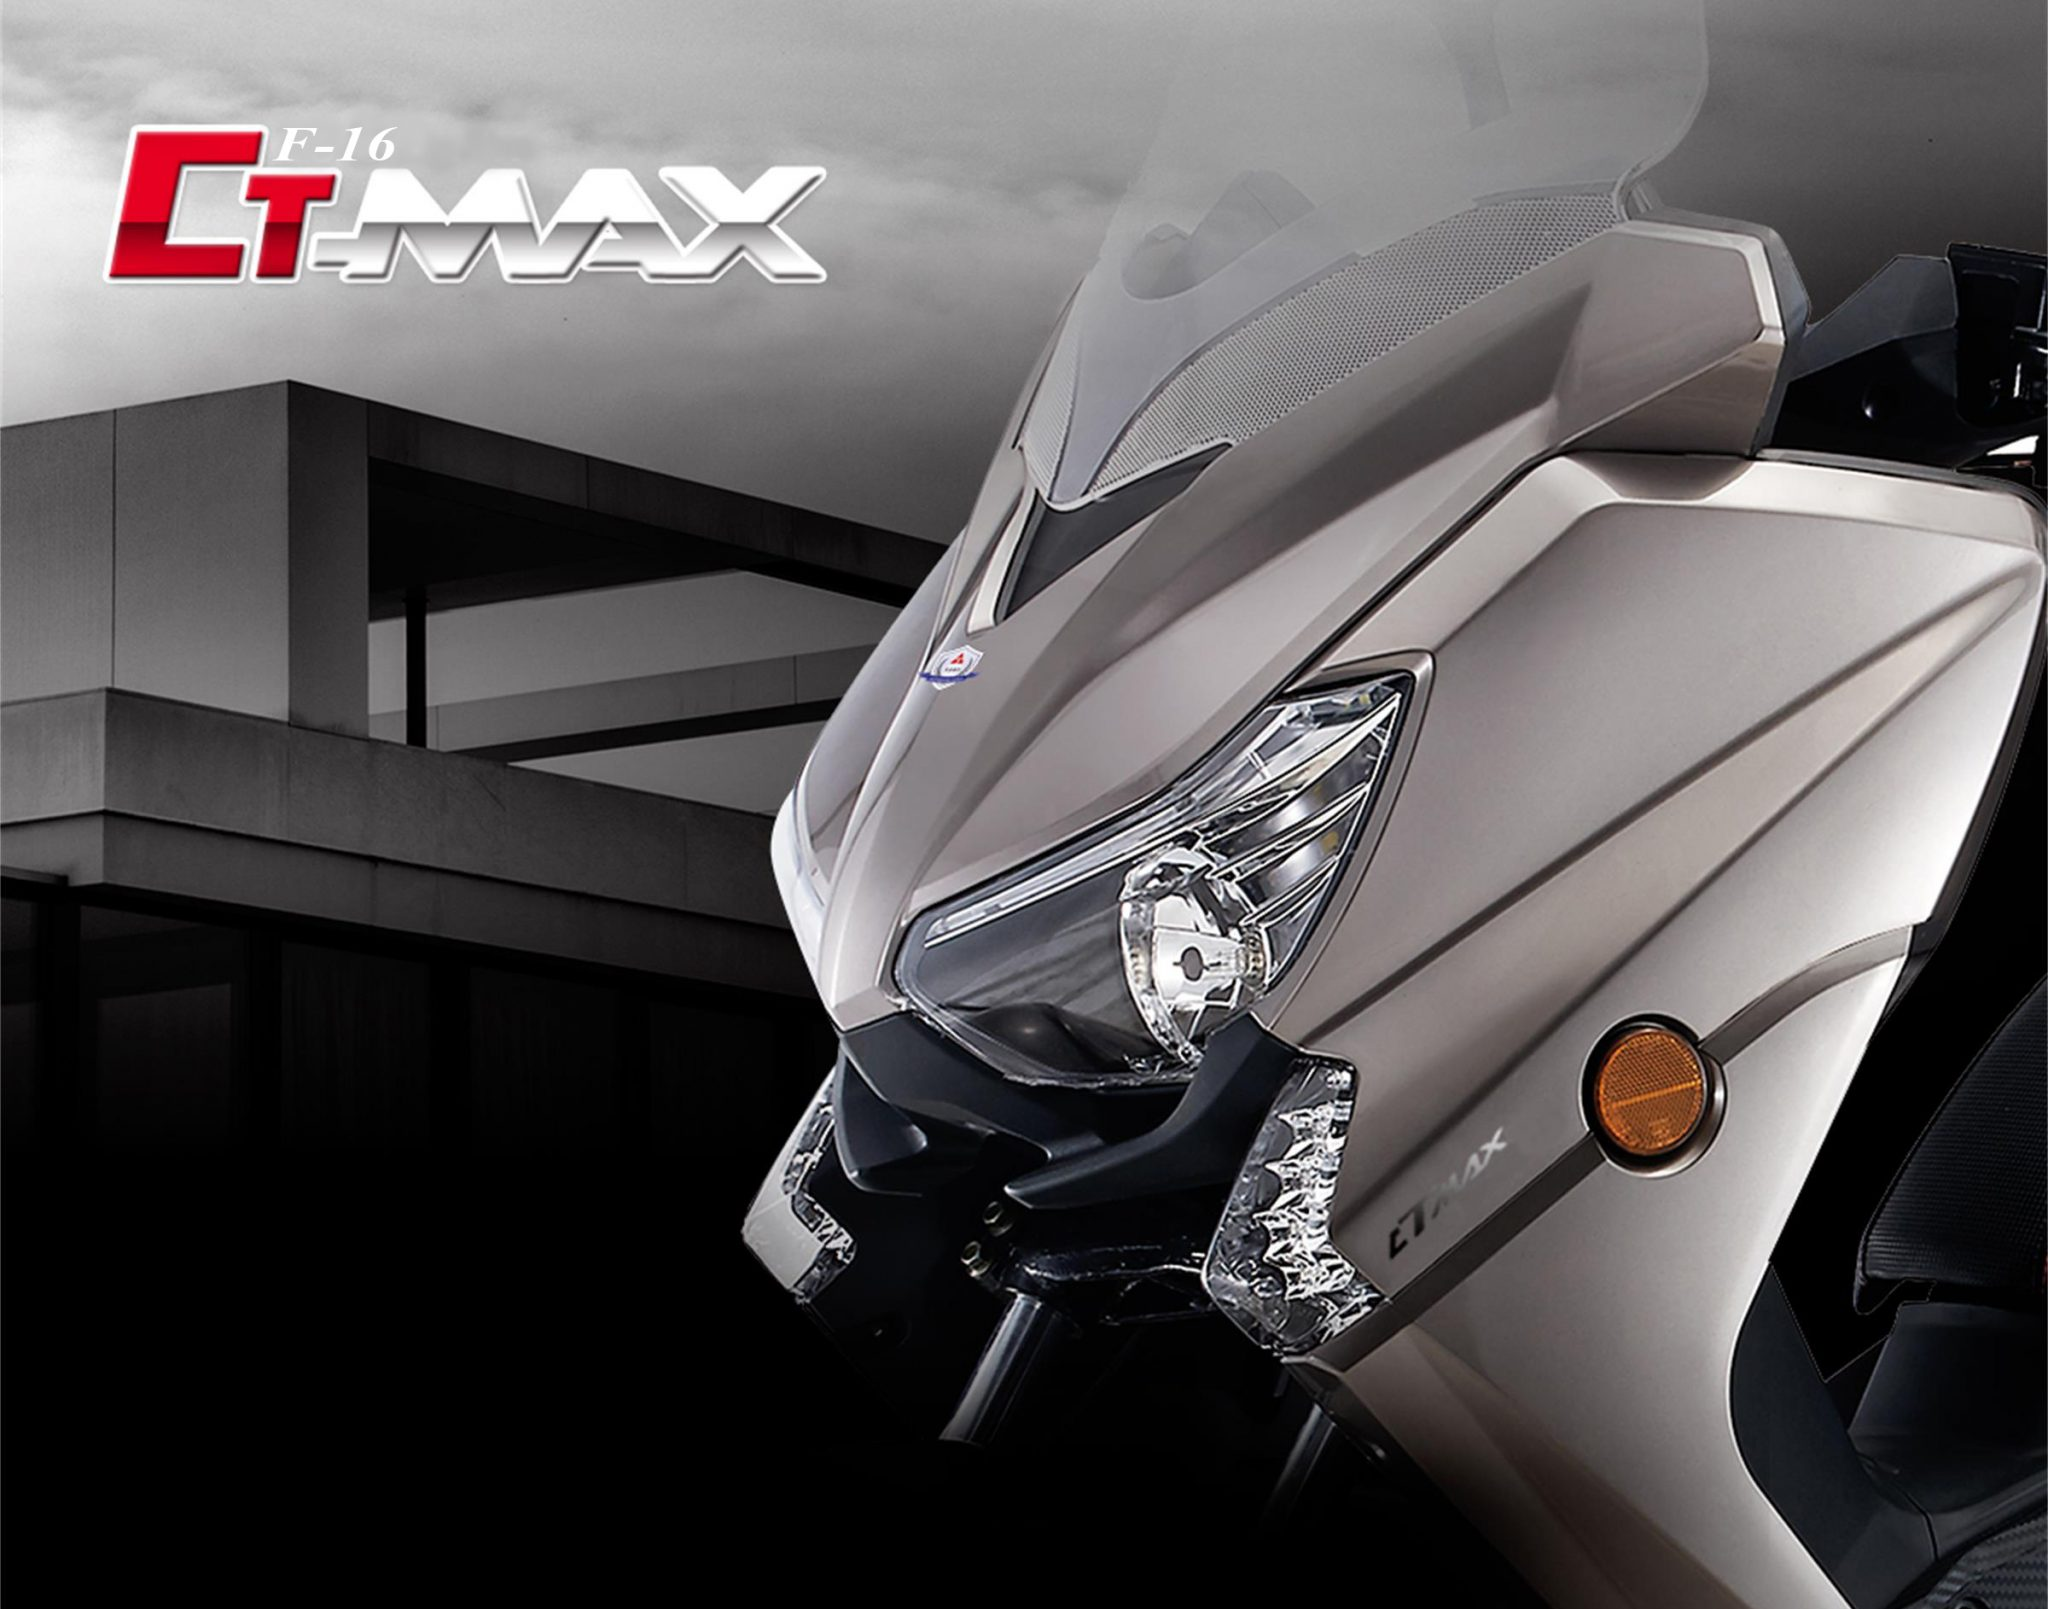 Taro CT Max 125cc Xmax kawe 3